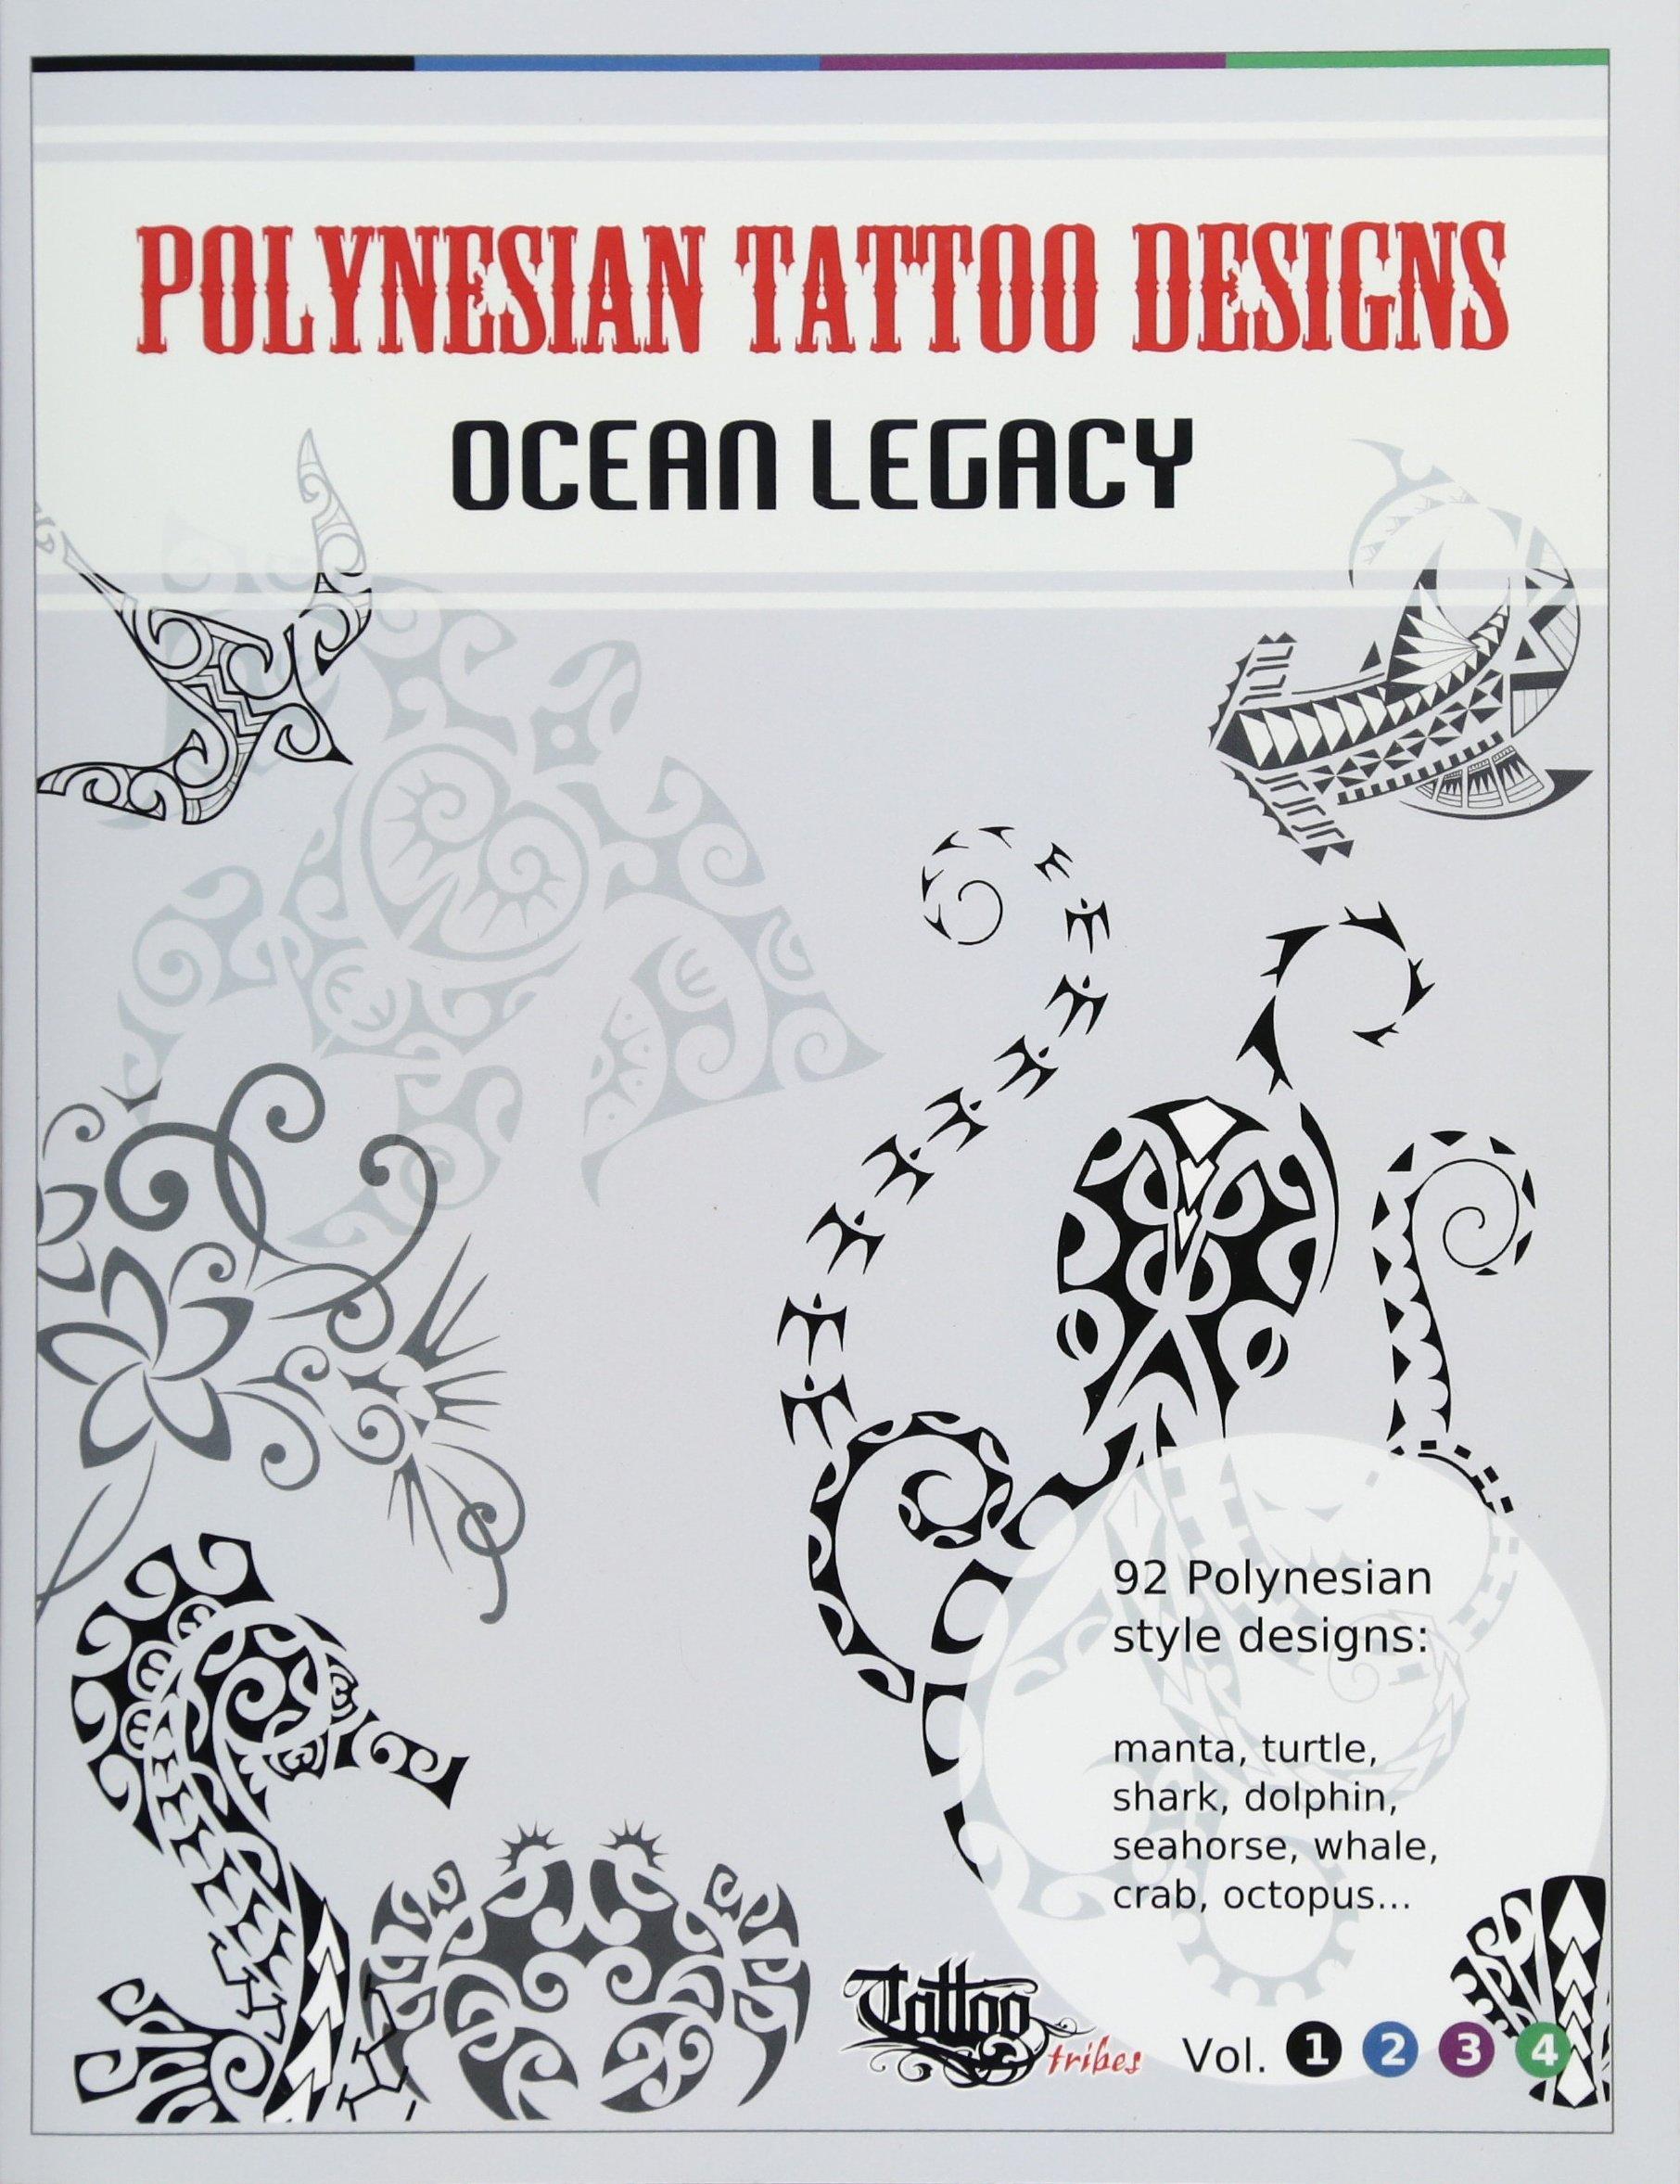 Polynesian Tattoo Designs Ocean Legacy TT Design Books Volume 1 Roberto Gemori 9788890601668 Amazon